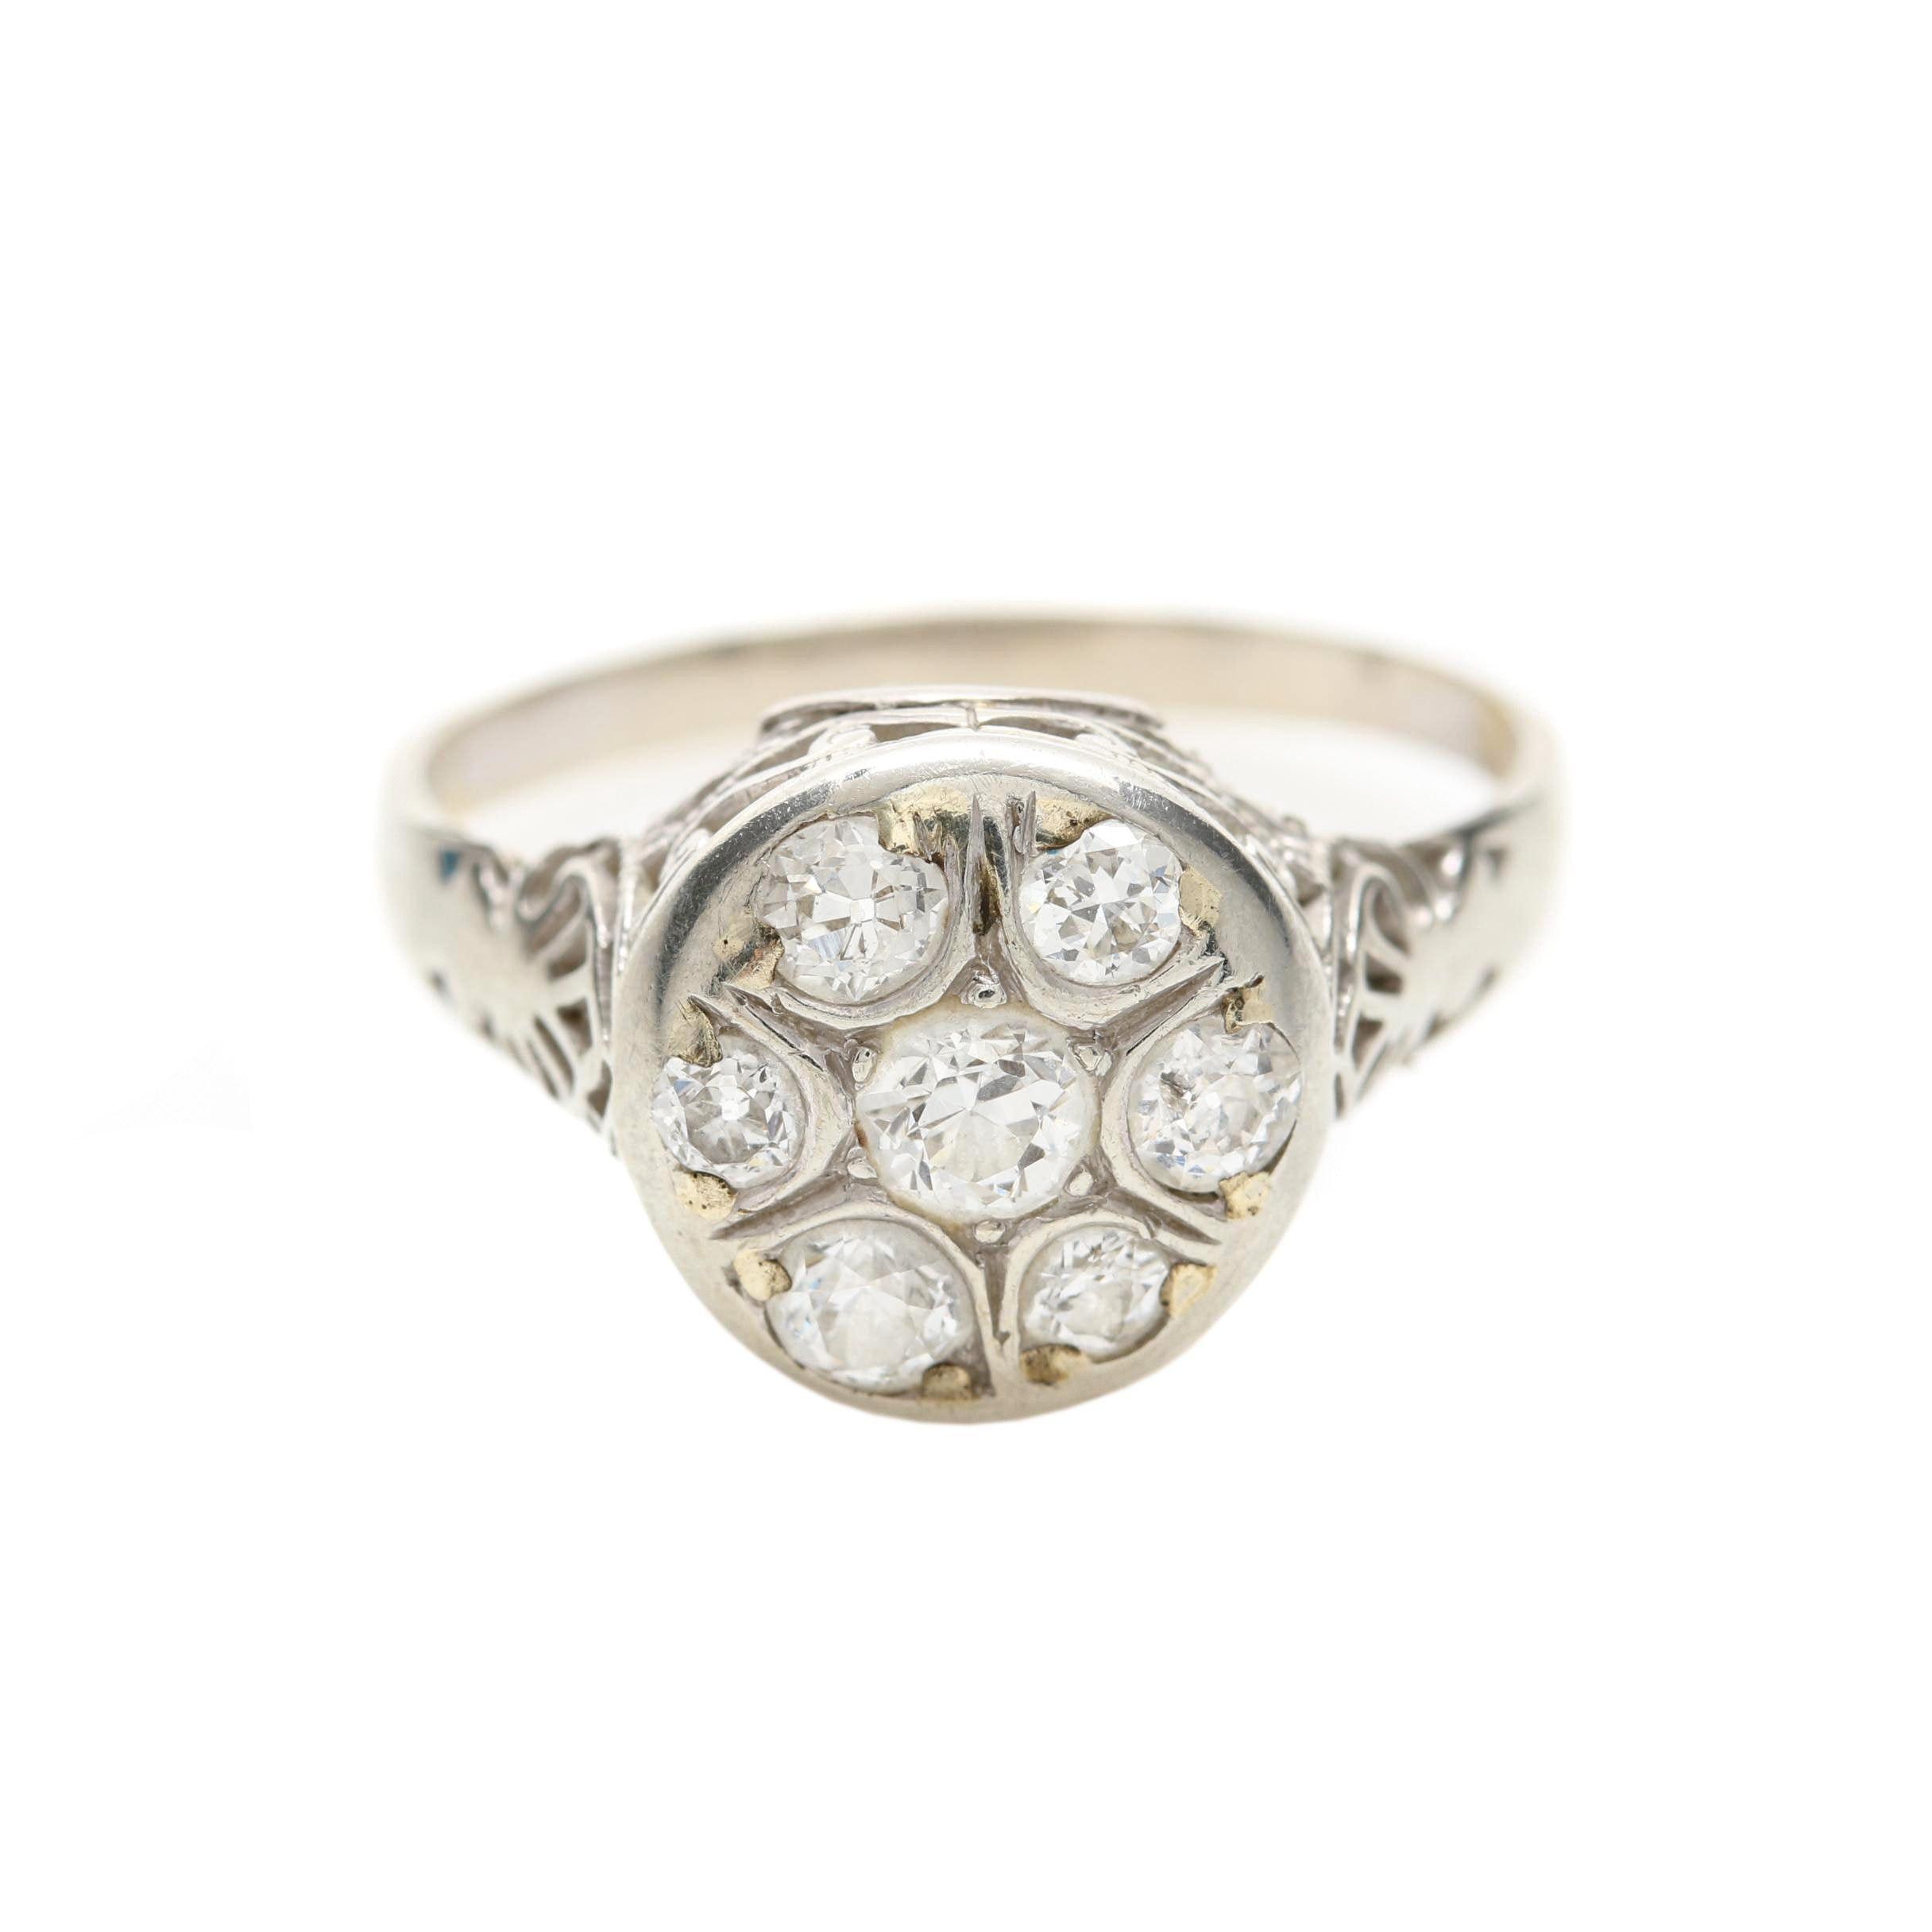 18K White Gold Old European Cut Diamond Ring